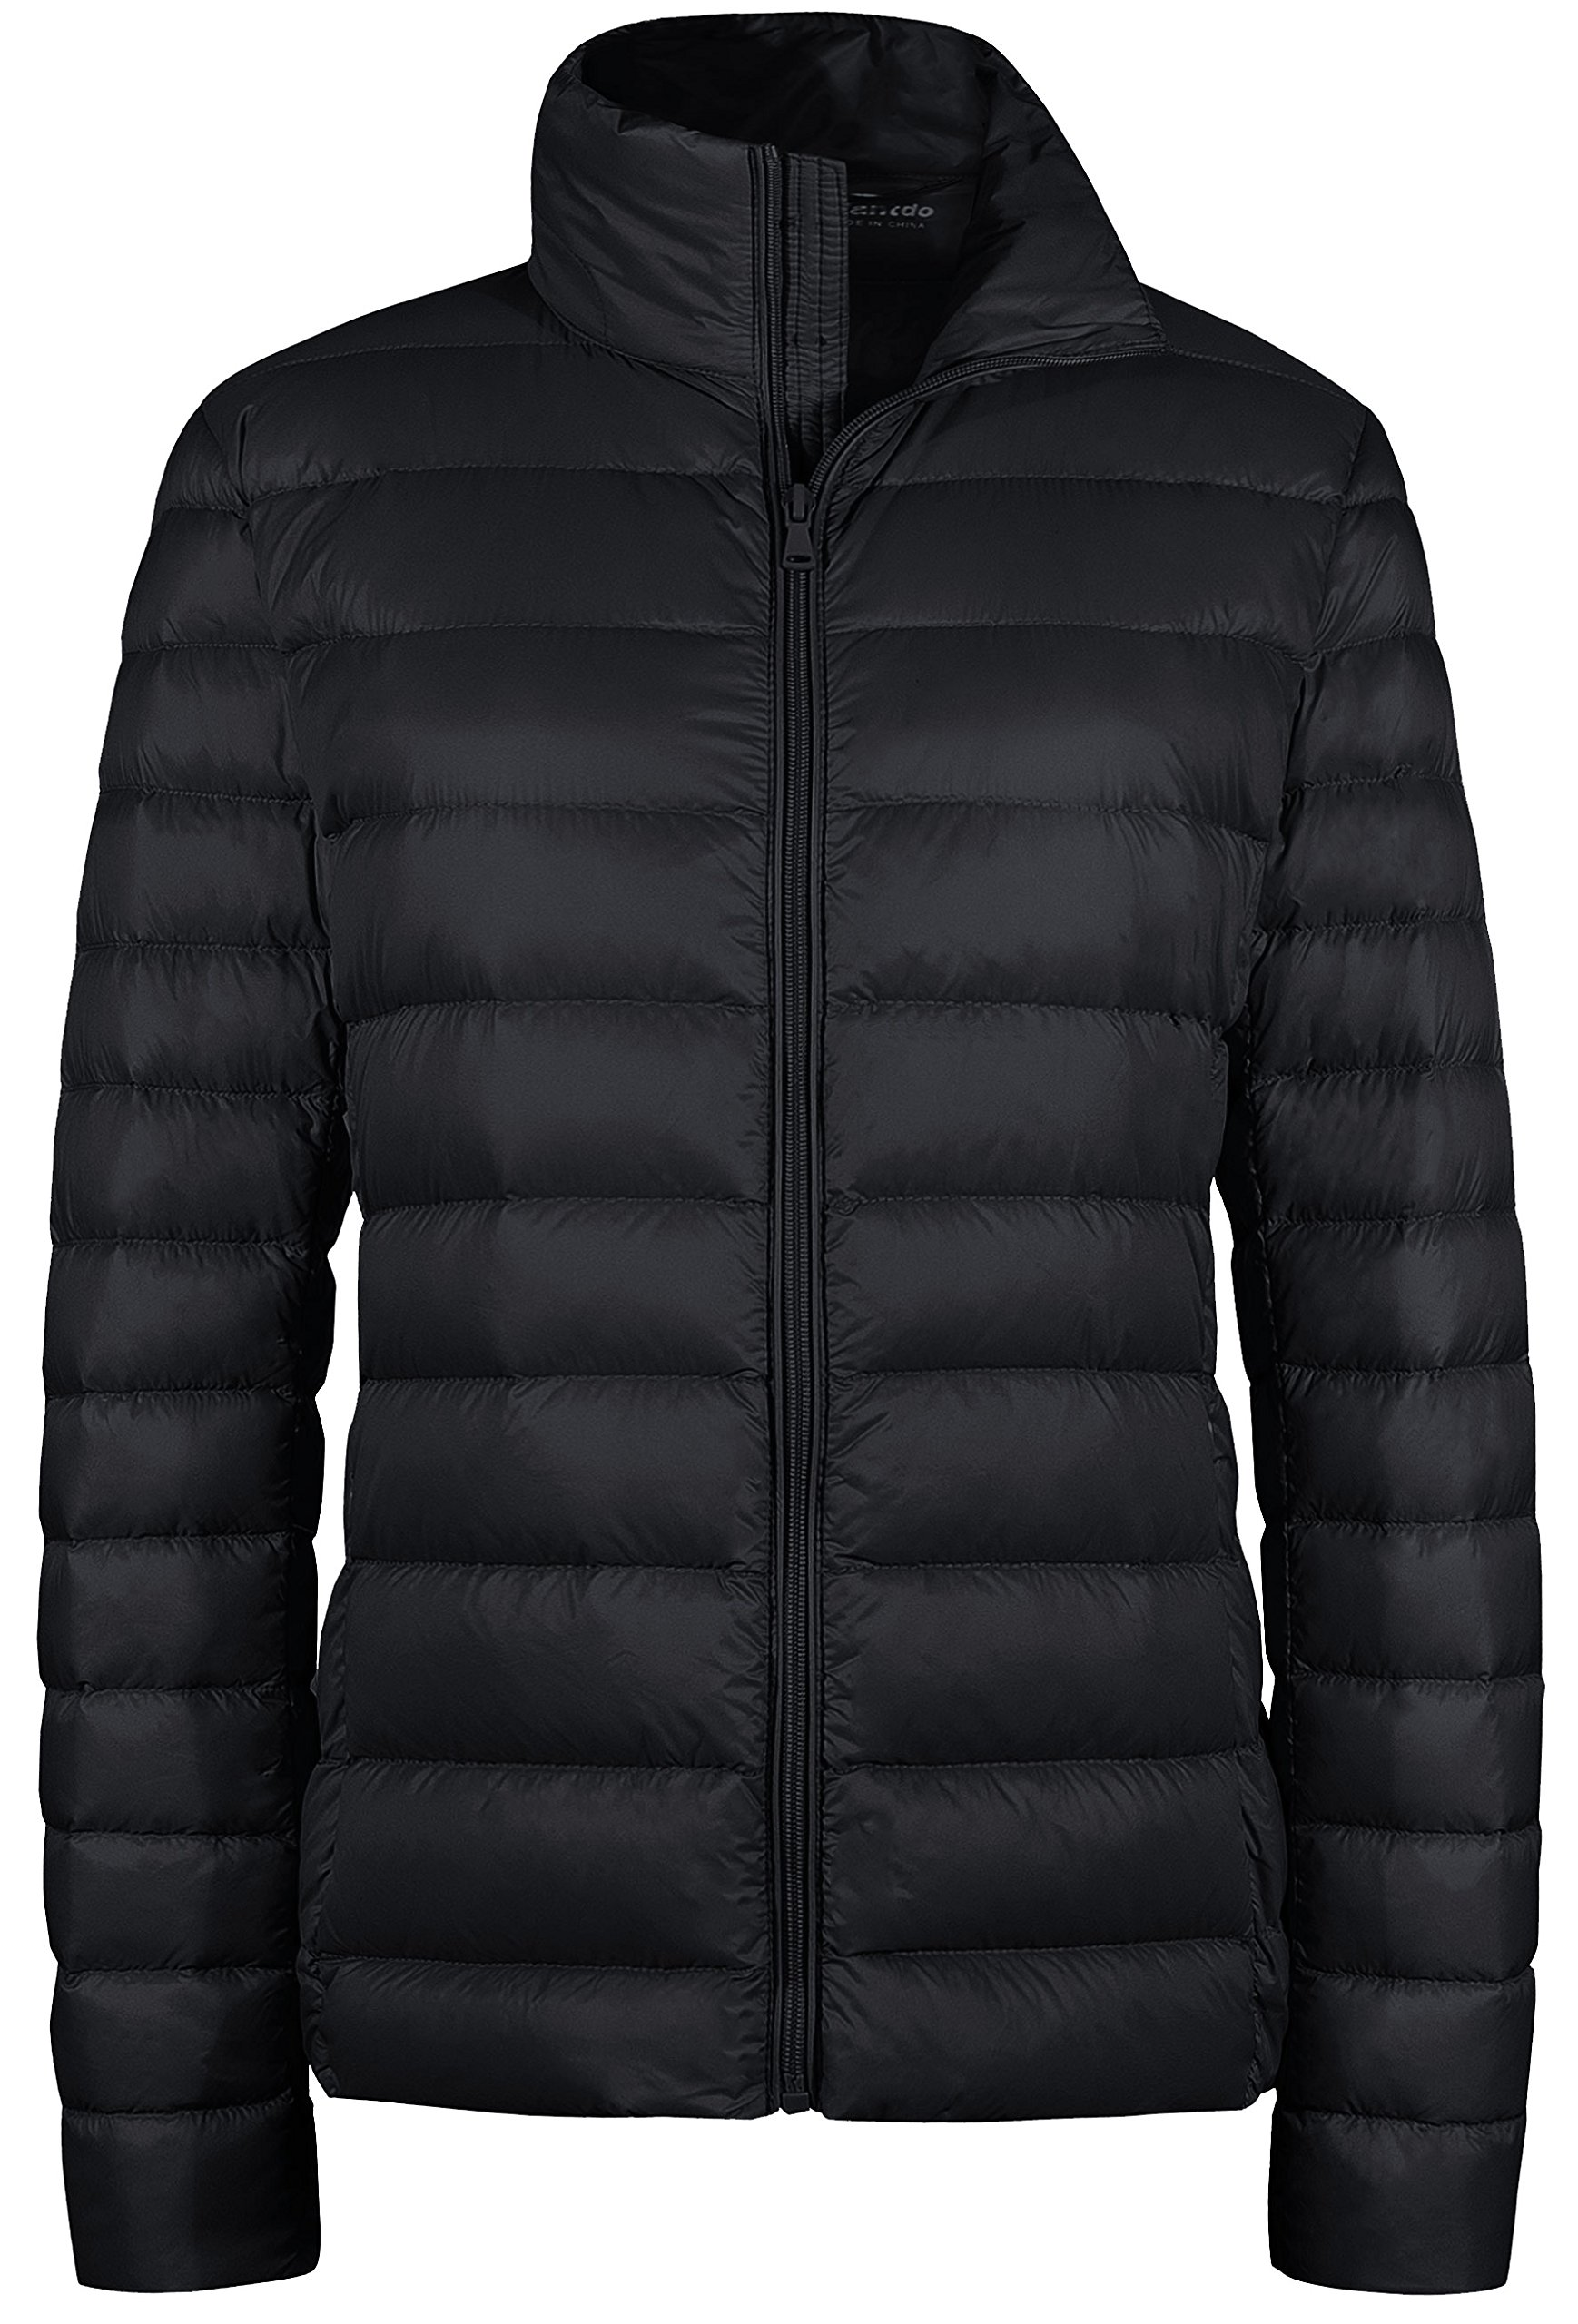 Wantdo Women's Puffy Coat Packable Ultra Light Weight Short Down Coat Black L by Wantdo